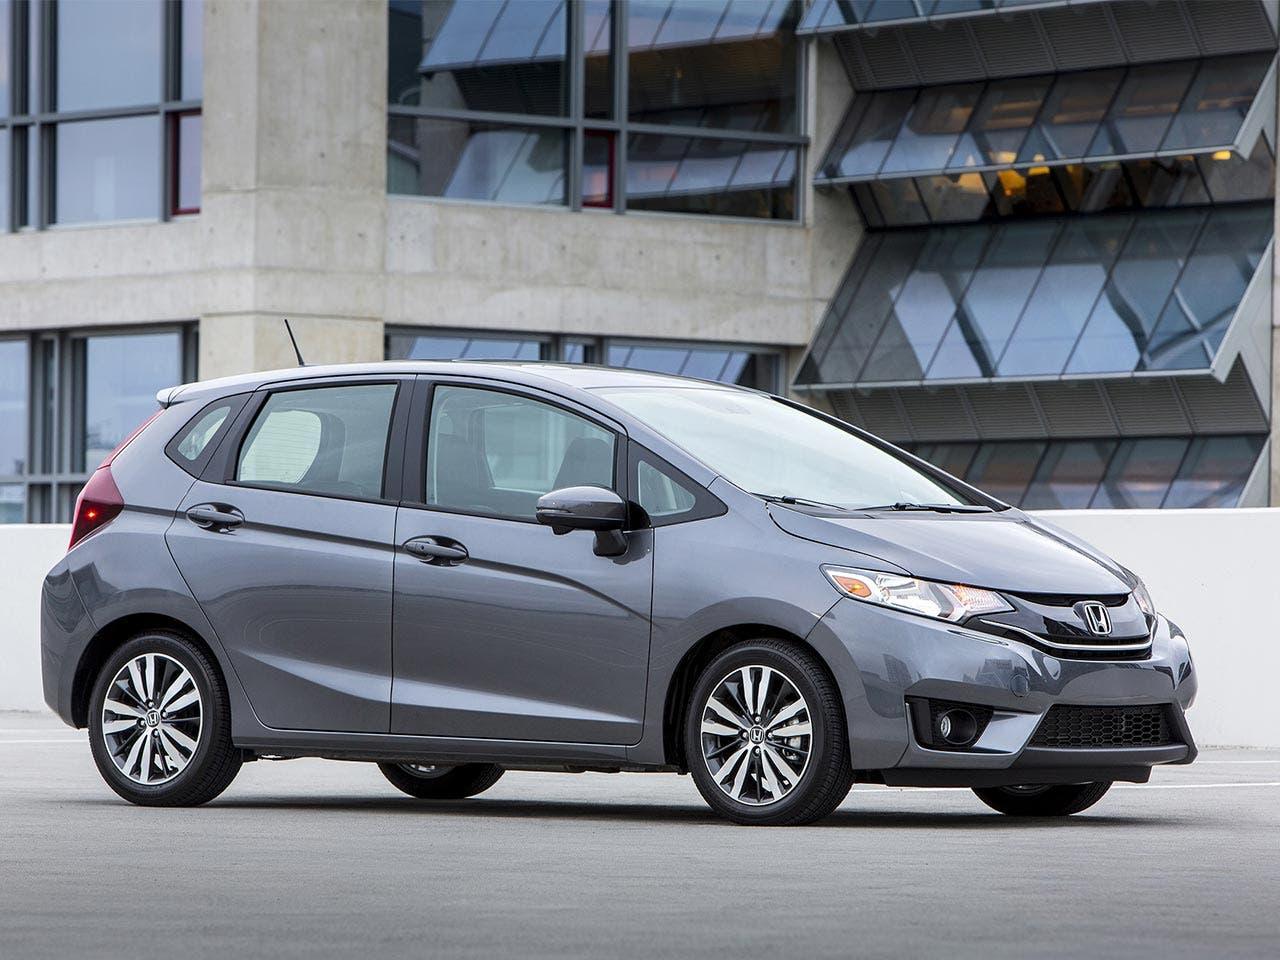 2017 Honda Fit (subcompact)